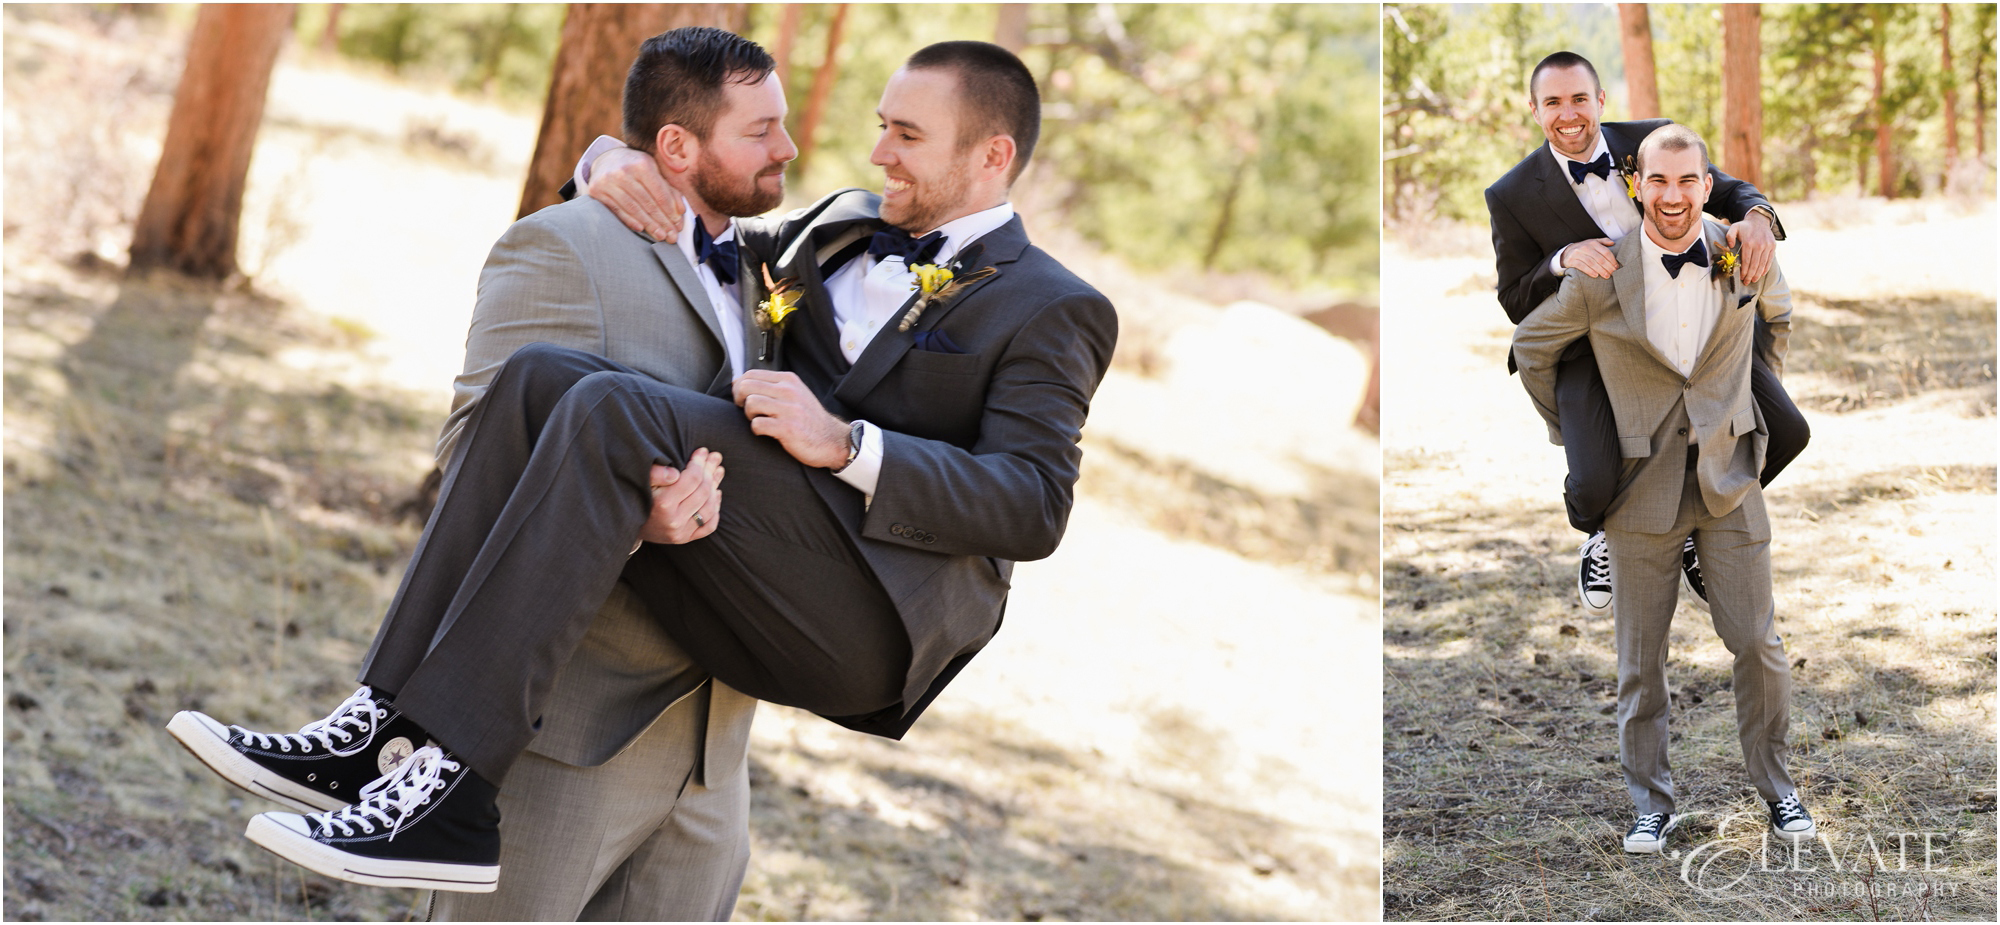 Jenn Blaine Della Terra Wedding Photos Denver